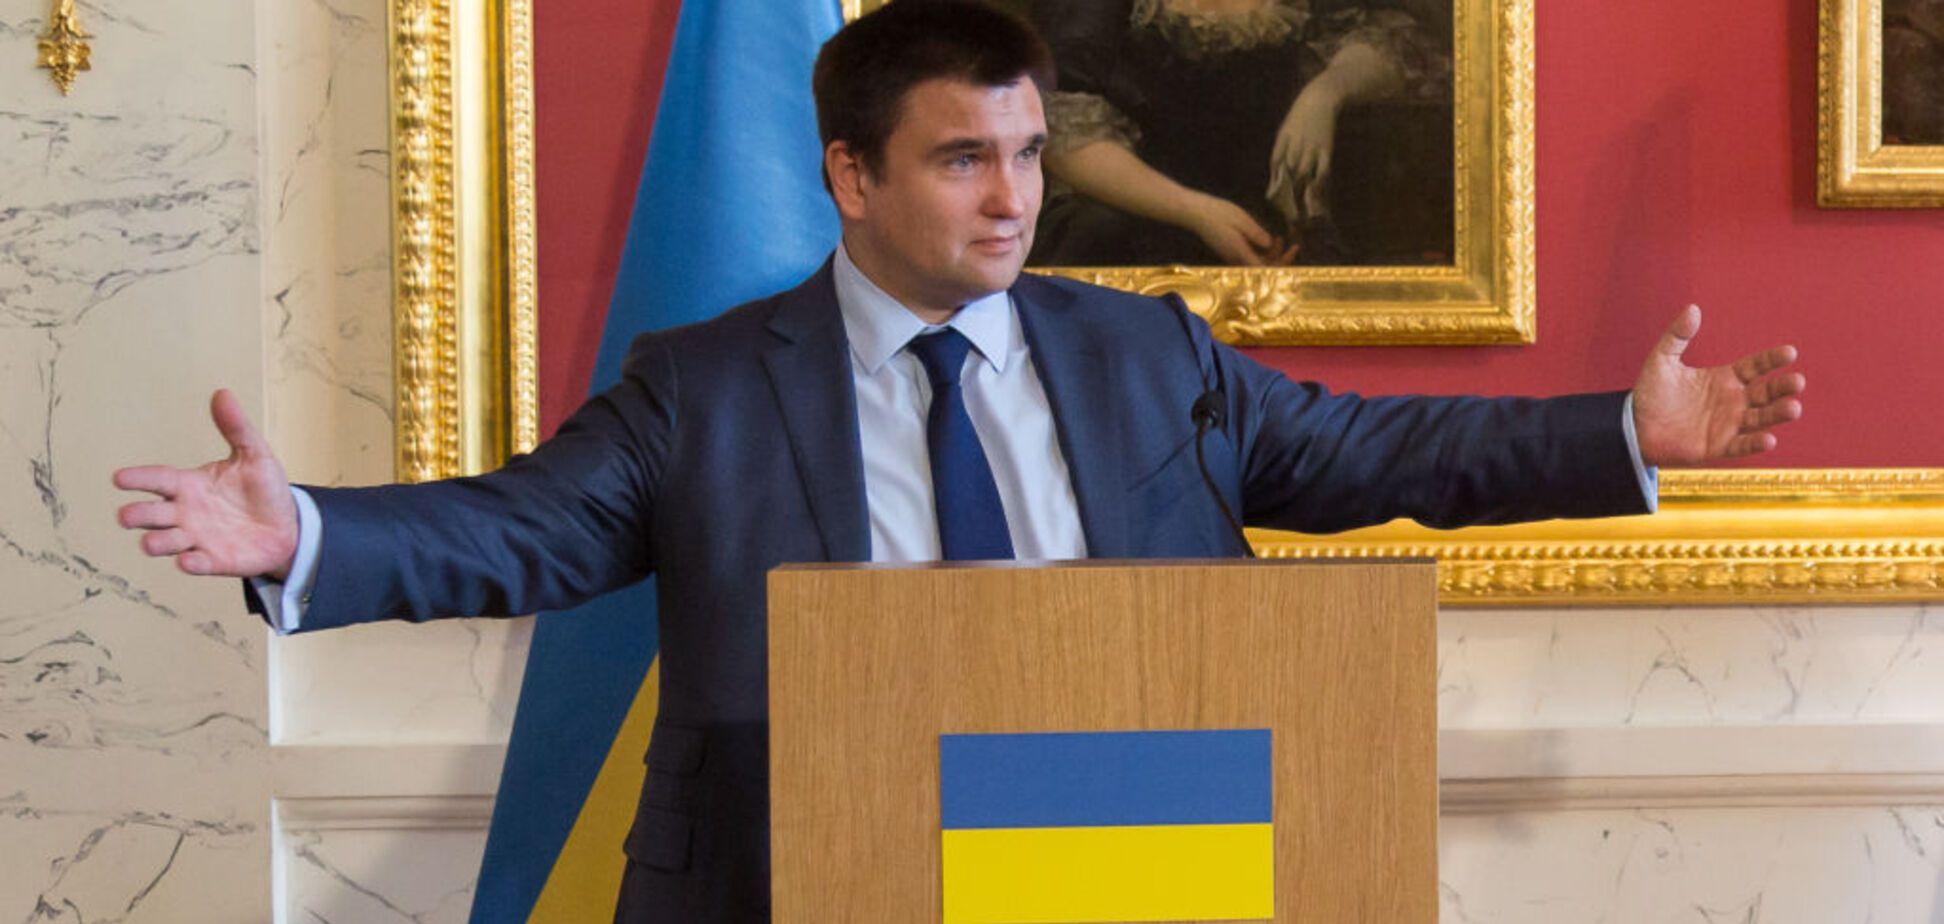 Volkswagen и Adidas накажут: Украина резко отреагировала на скандал с Крымом